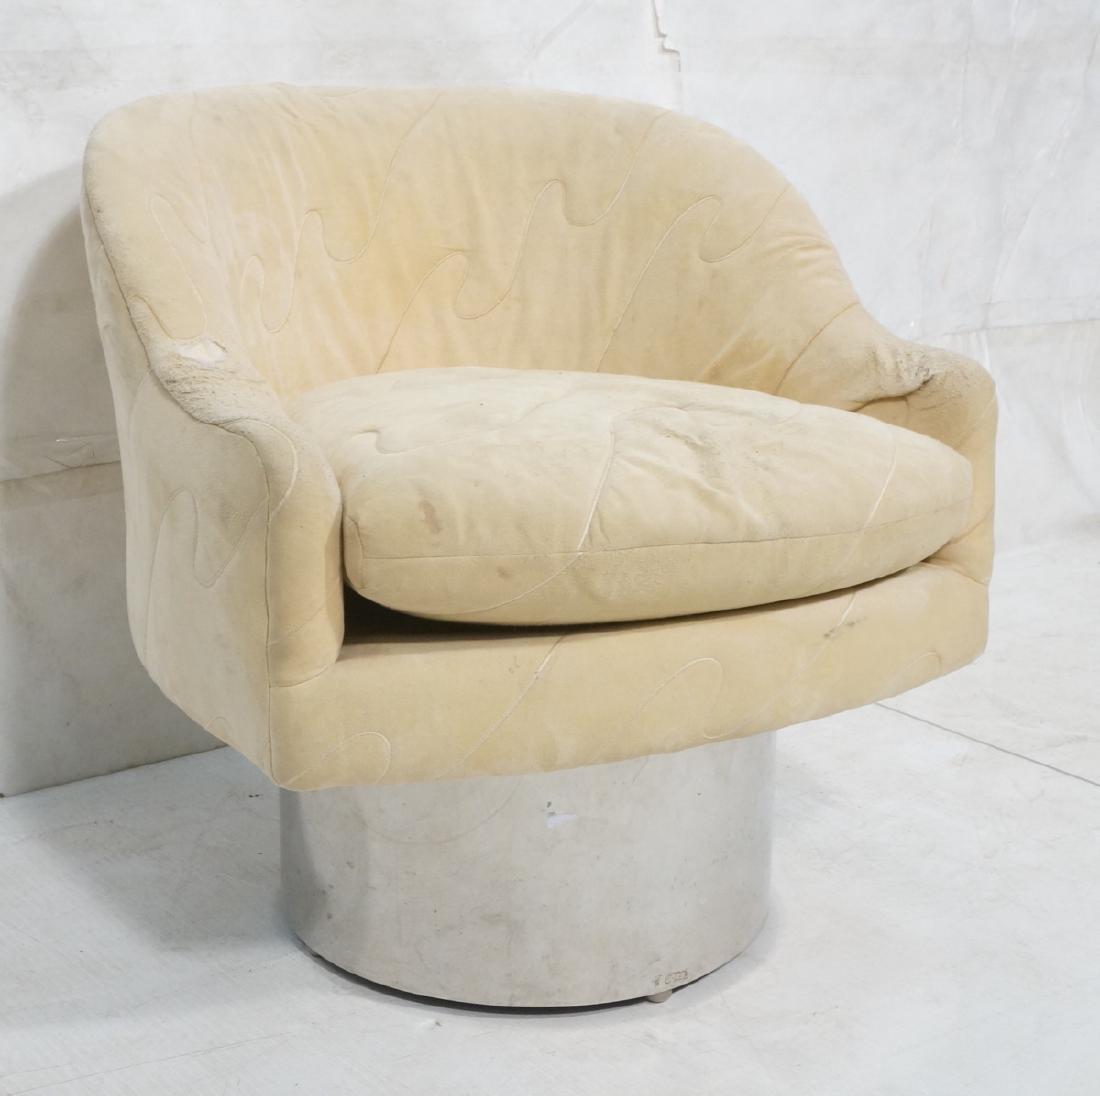 MILO BAUGHMAN Style Modern Lounge Chair. Tall chr